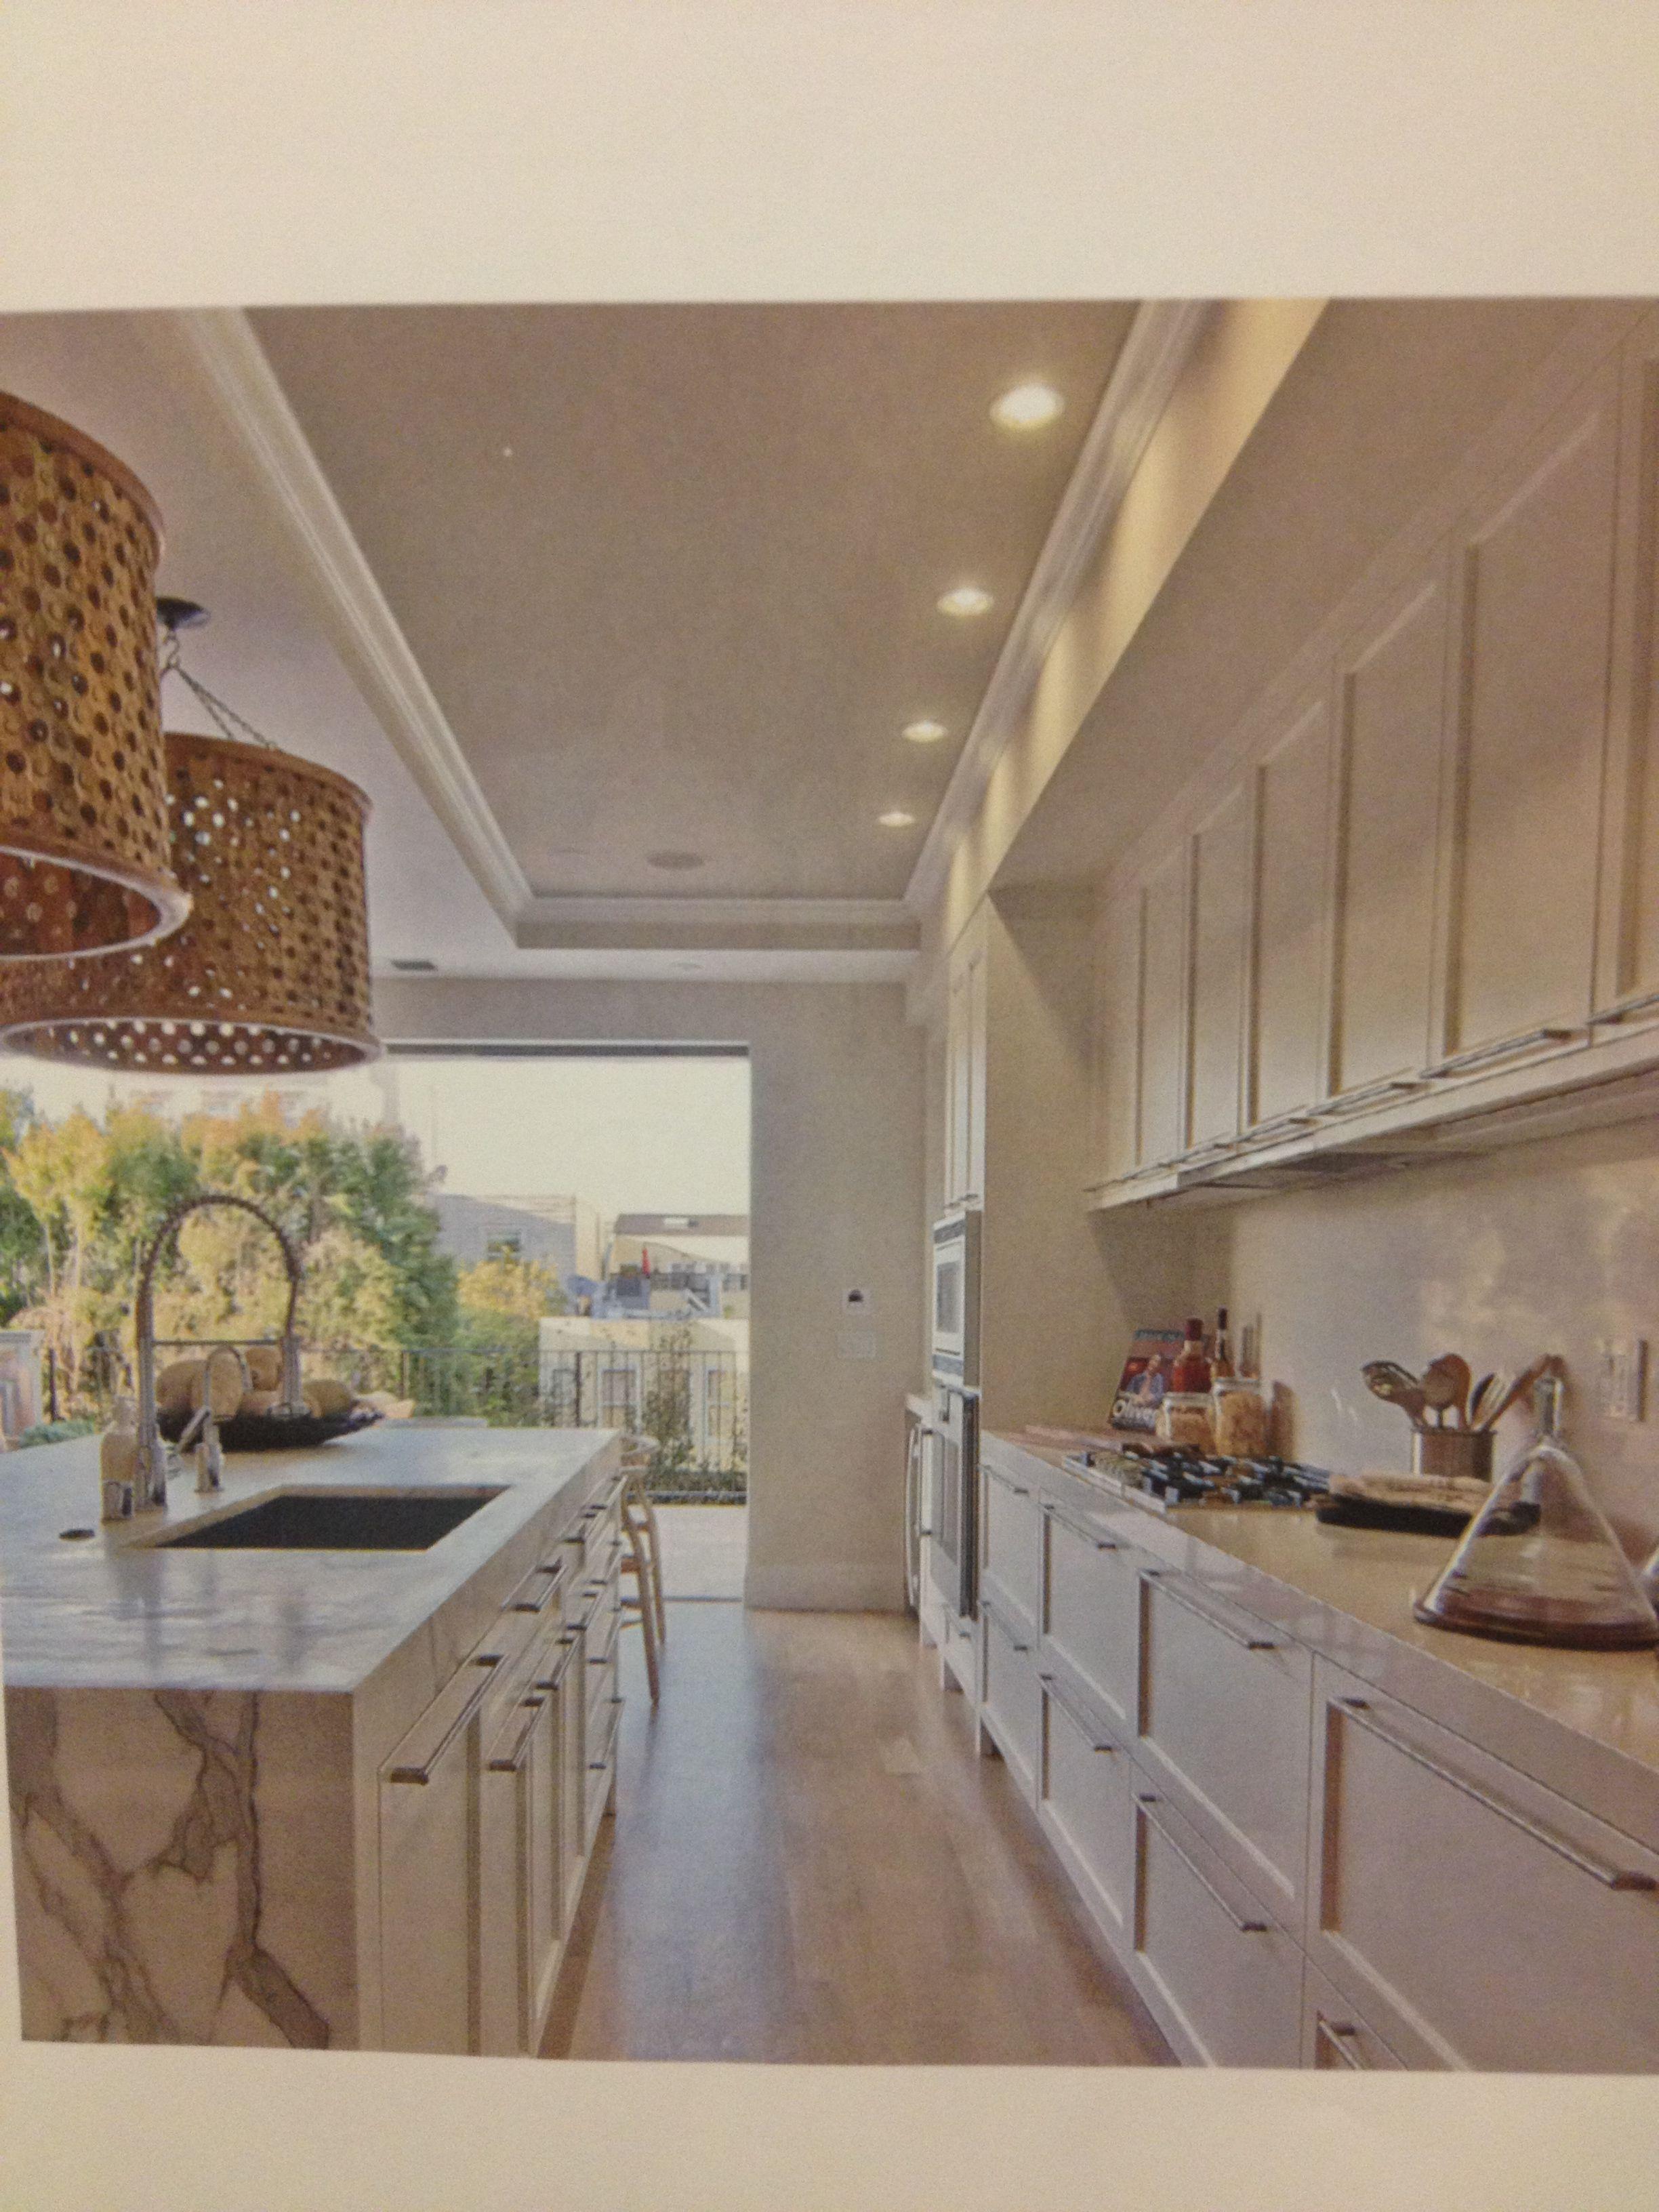 Modern Classic Kitchen Design: Modern Classic Kitchen Design. Absolutely Stunning